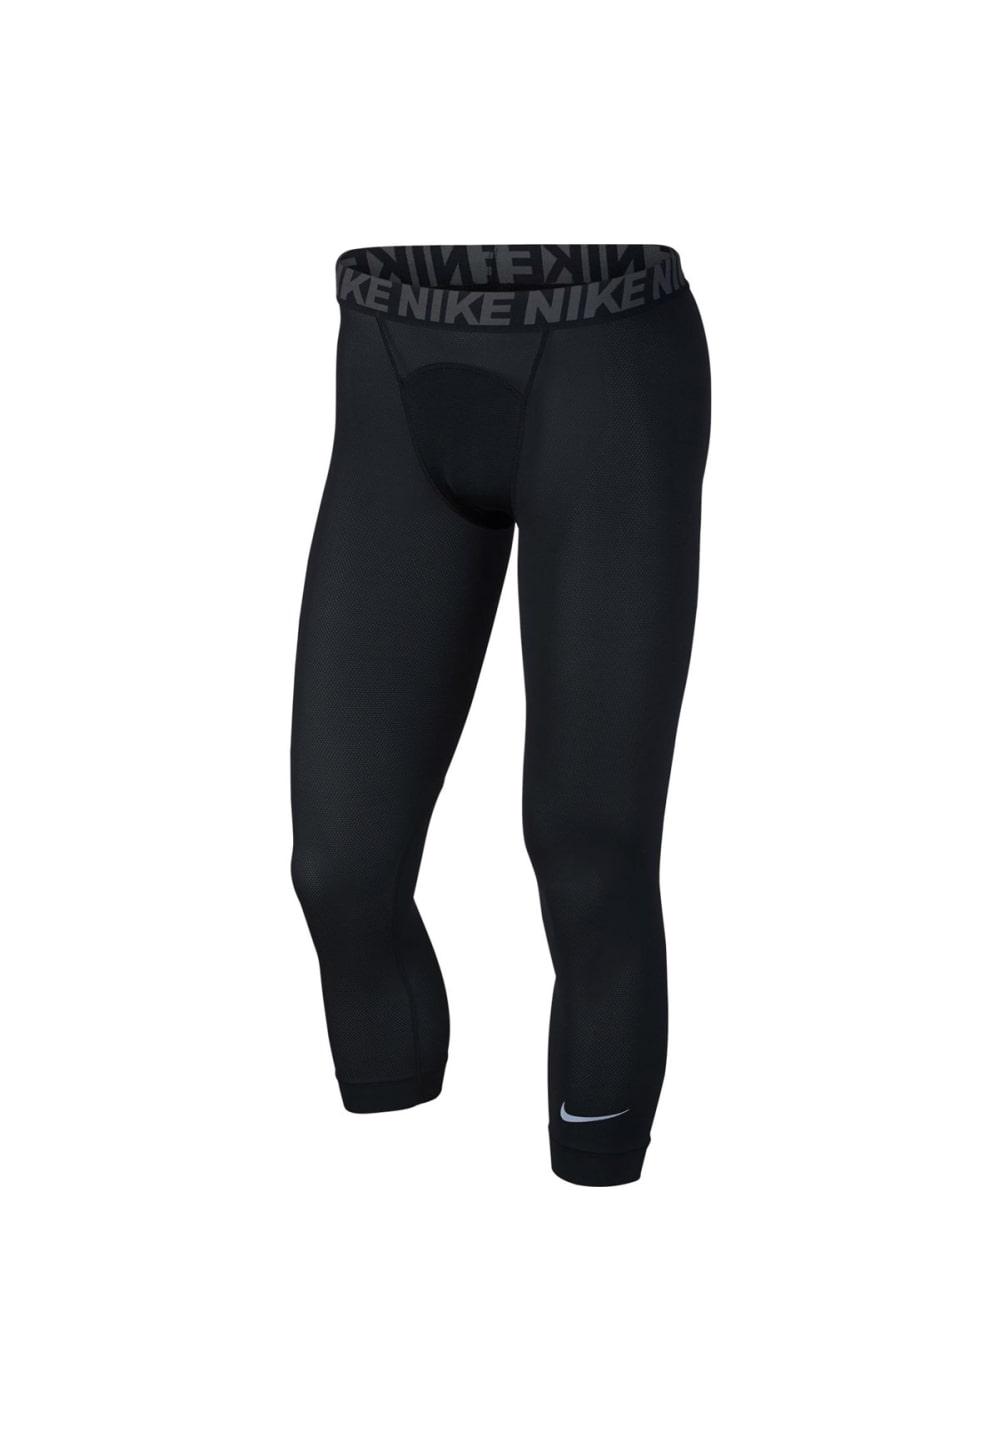 3qt Utility Nike Tight Fitness Homme Pour Noir Pantalons Yv6b7Ifmgy